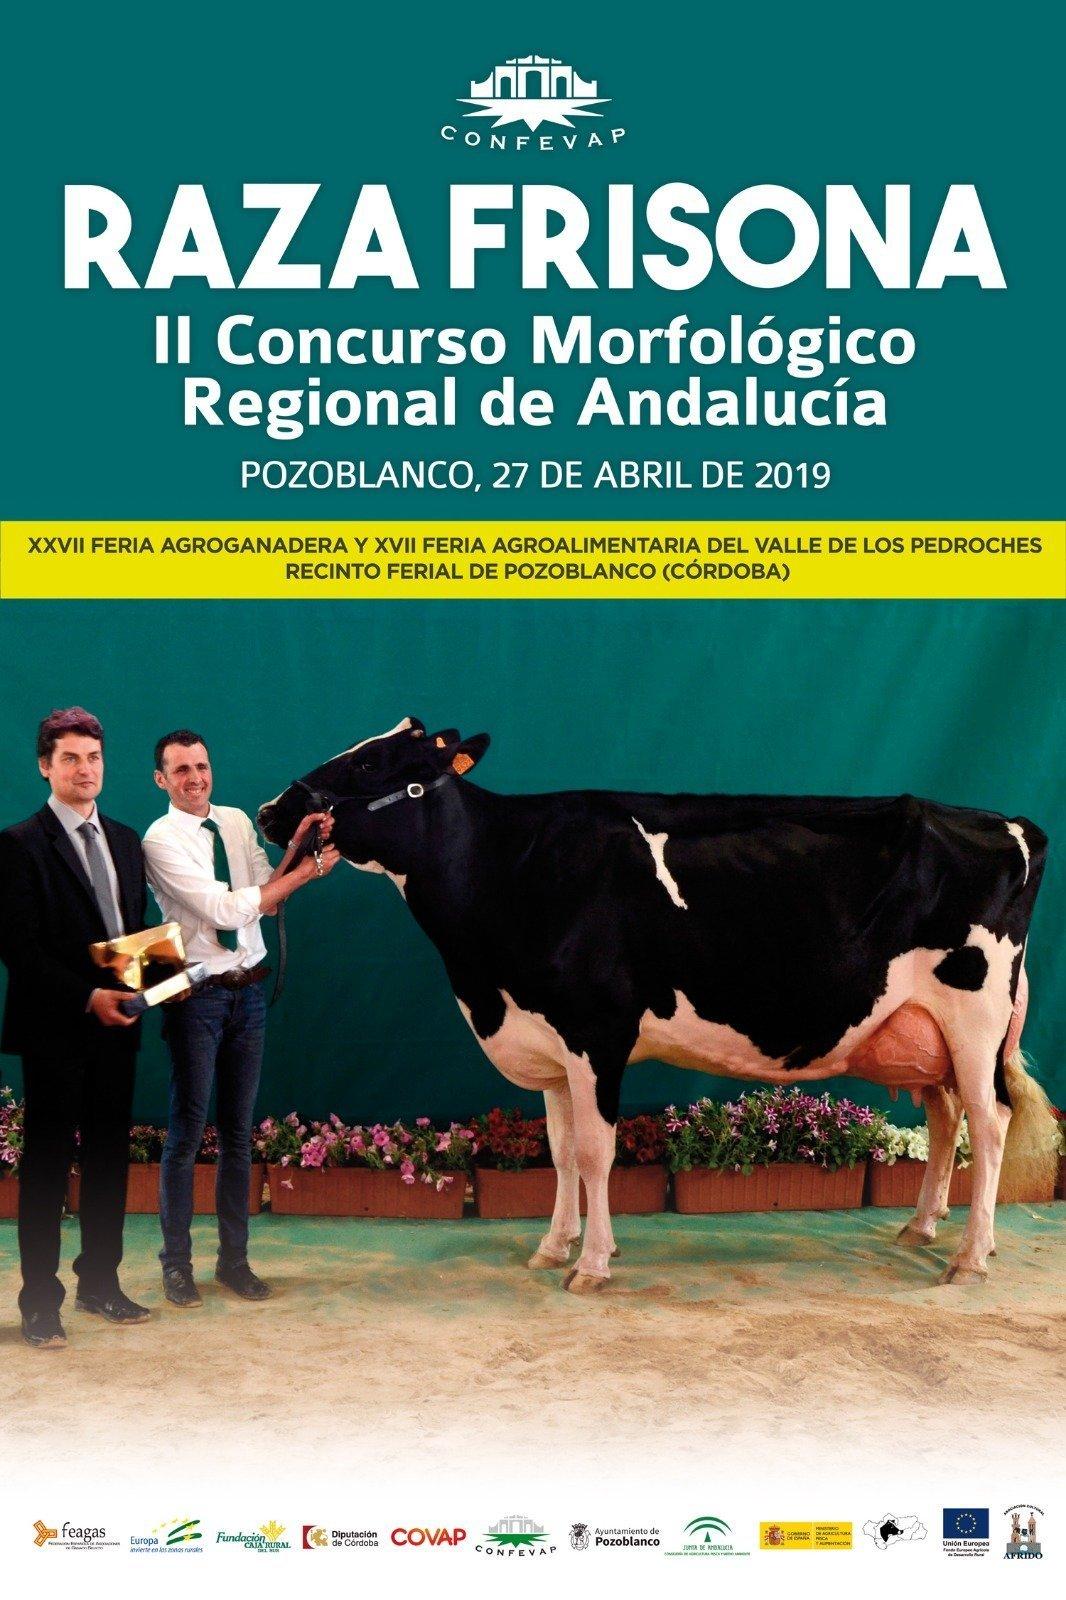 II Concurso Morfológico Regional de Andalucia Raza Frisona Pozoblanco